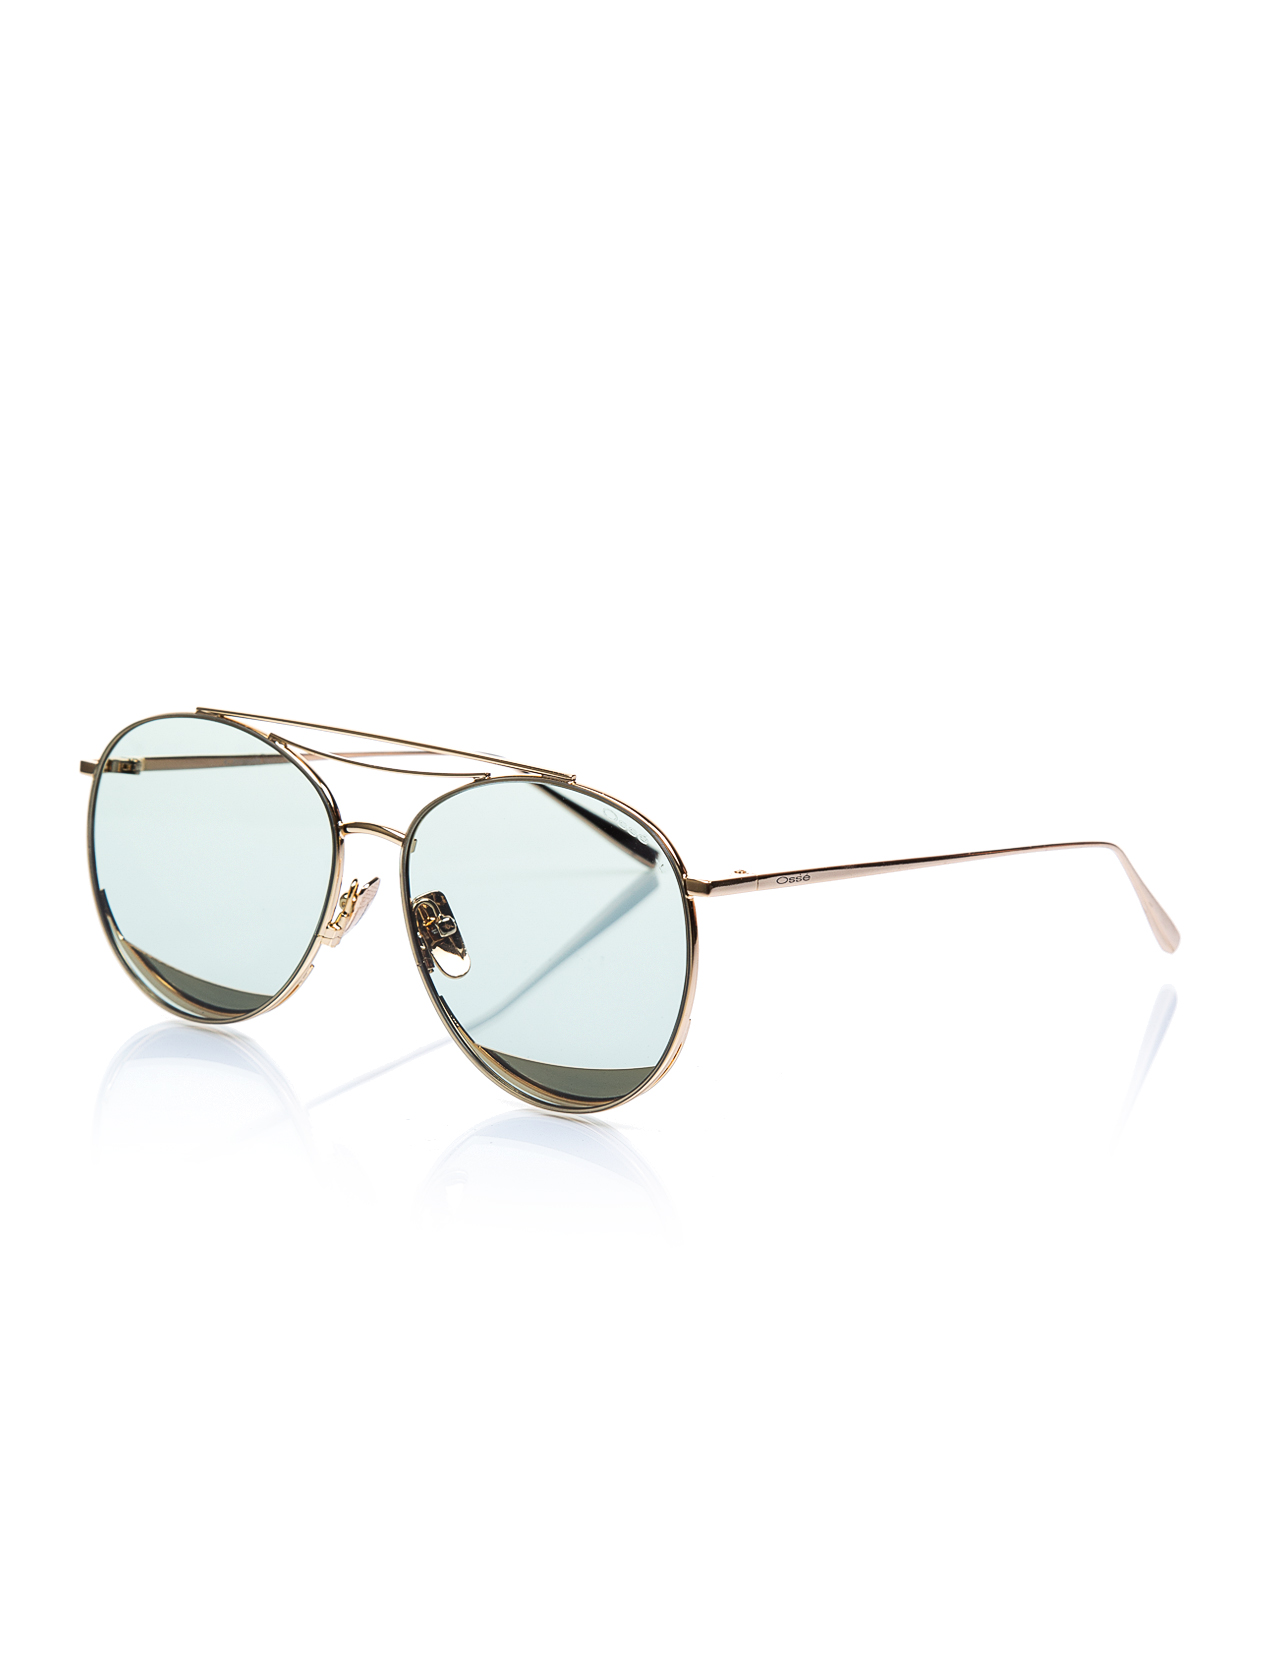 Women's sunglasses os 2676 03 metal gold organic drop pilot 59-16-147 osse